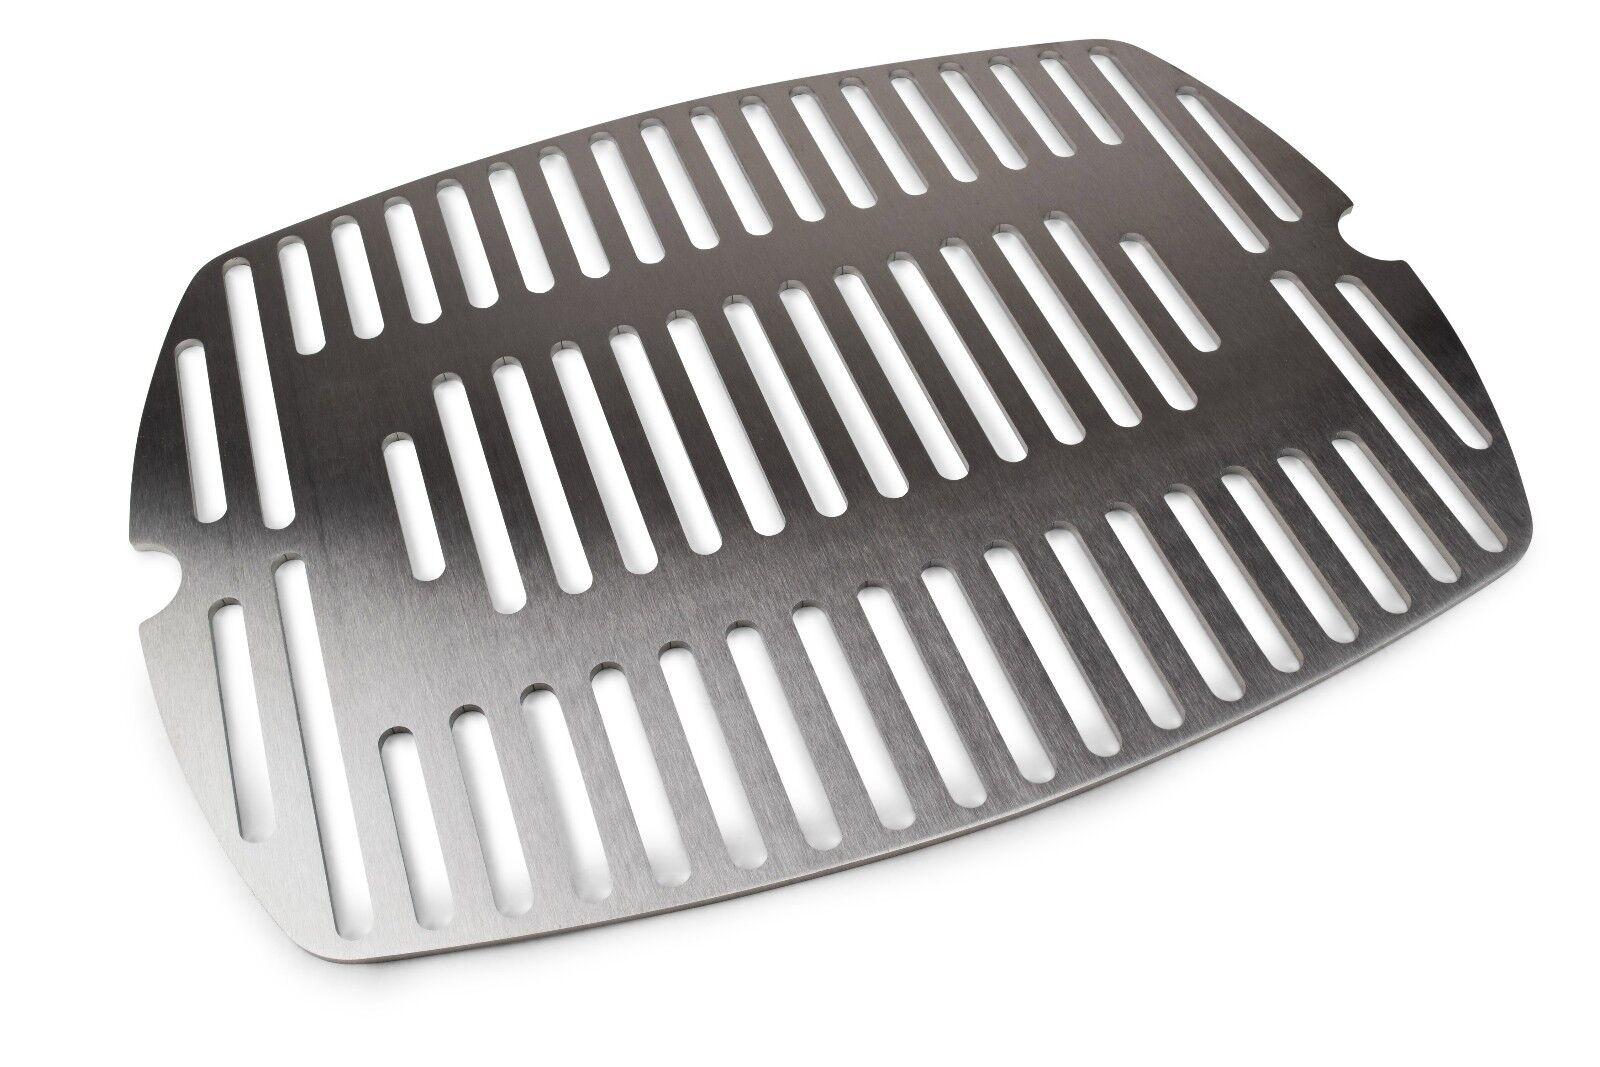 Weber Gasgrill Q 1200 Billig : Weber grill q test vergleich weber grill q günstig kaufen